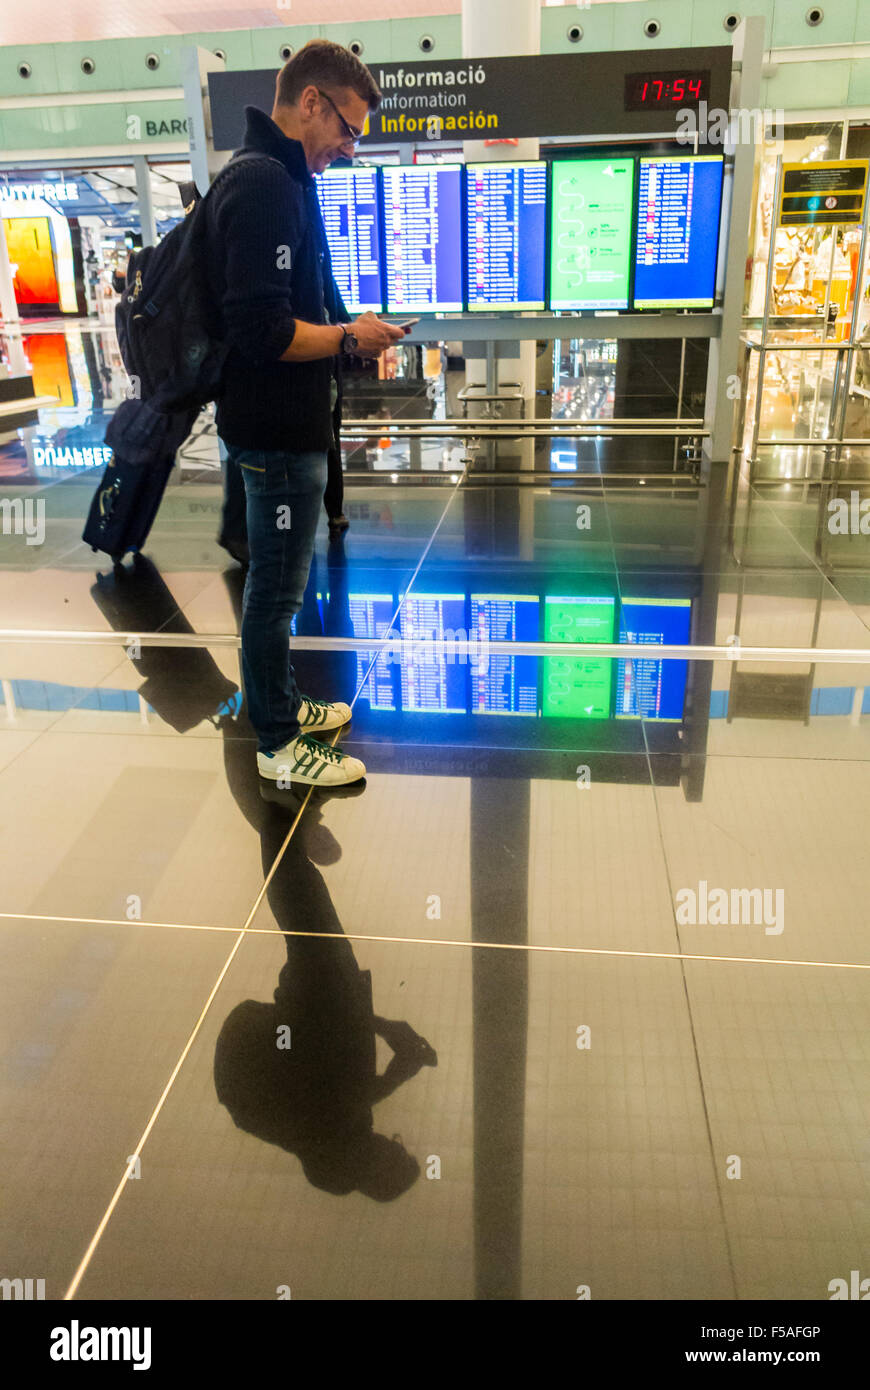 "Barcelona, Spain, Airport ""El Prat"", Terminal 1, Scenes, Man Looking at Smart Phone in Hallway, Departures Sign, Stock Photo"